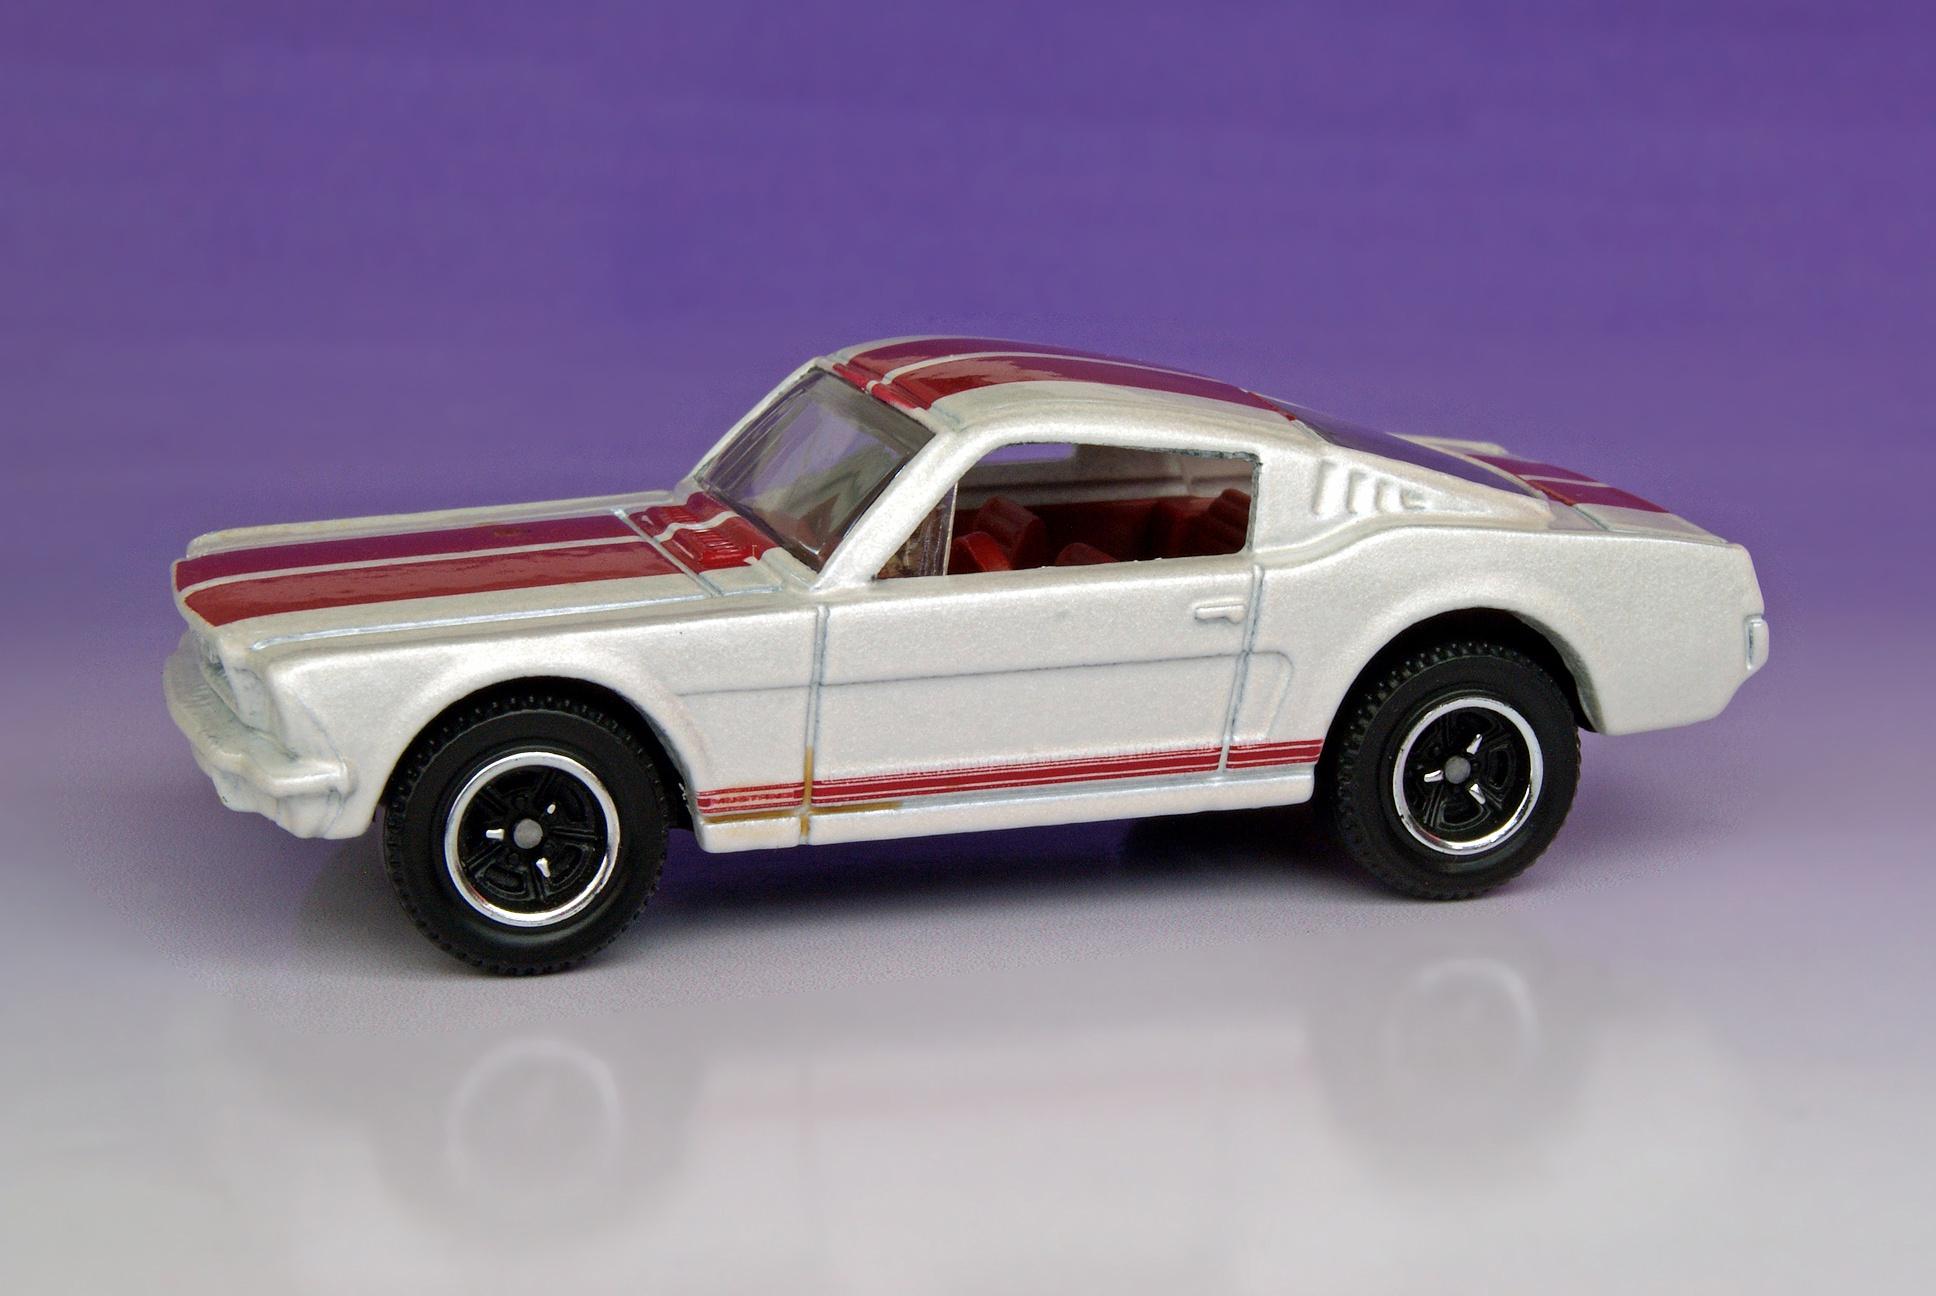 65 Mustang Gt Matchbox Cars Wiki Fandom Powered By Wikia